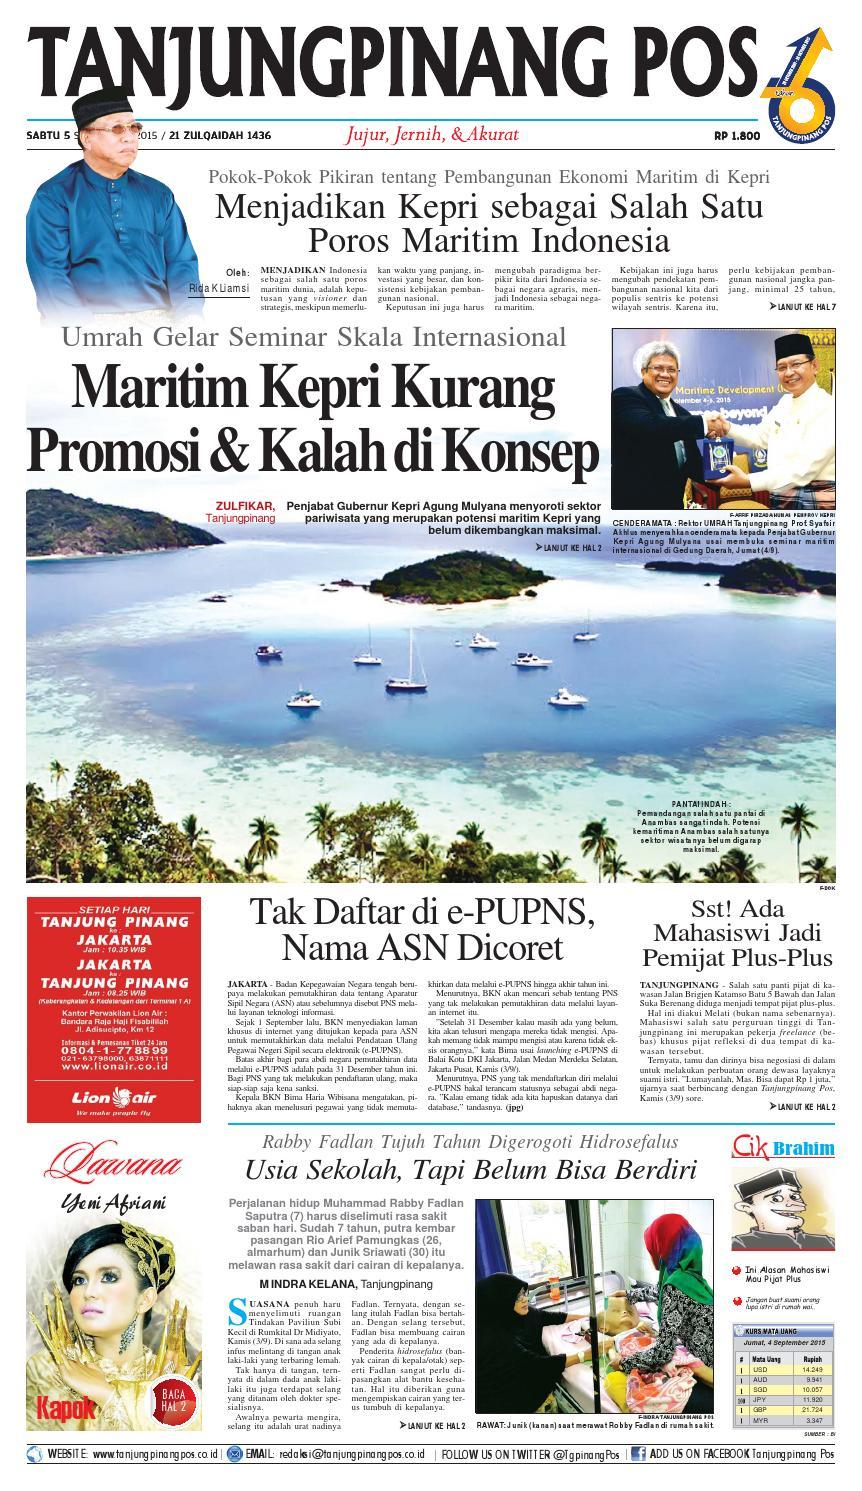 epaper tanjungpinang pos 5 september 2015 by